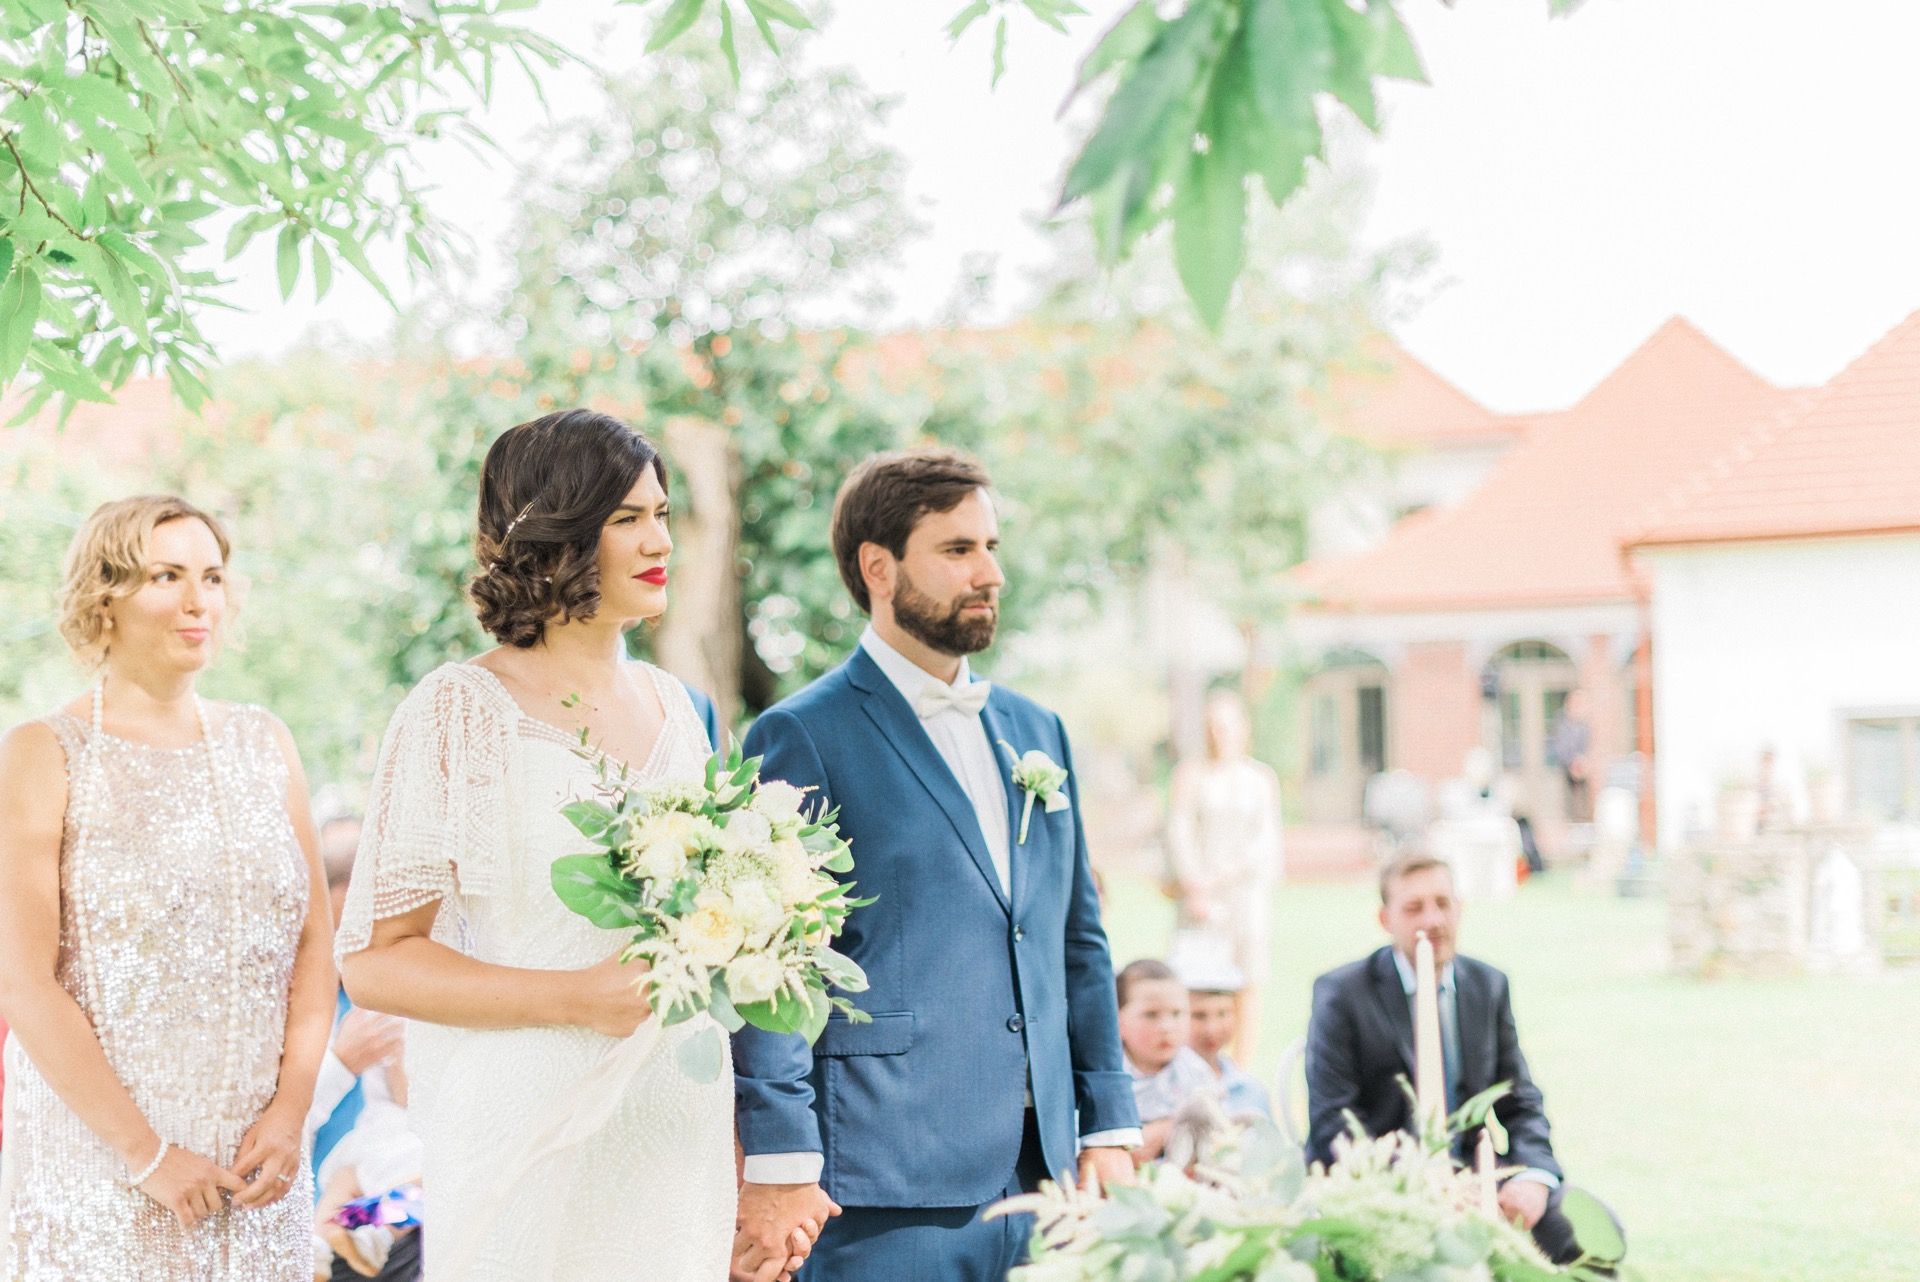 Wedding Zuzana Matu 4 7 2018-edit-0229